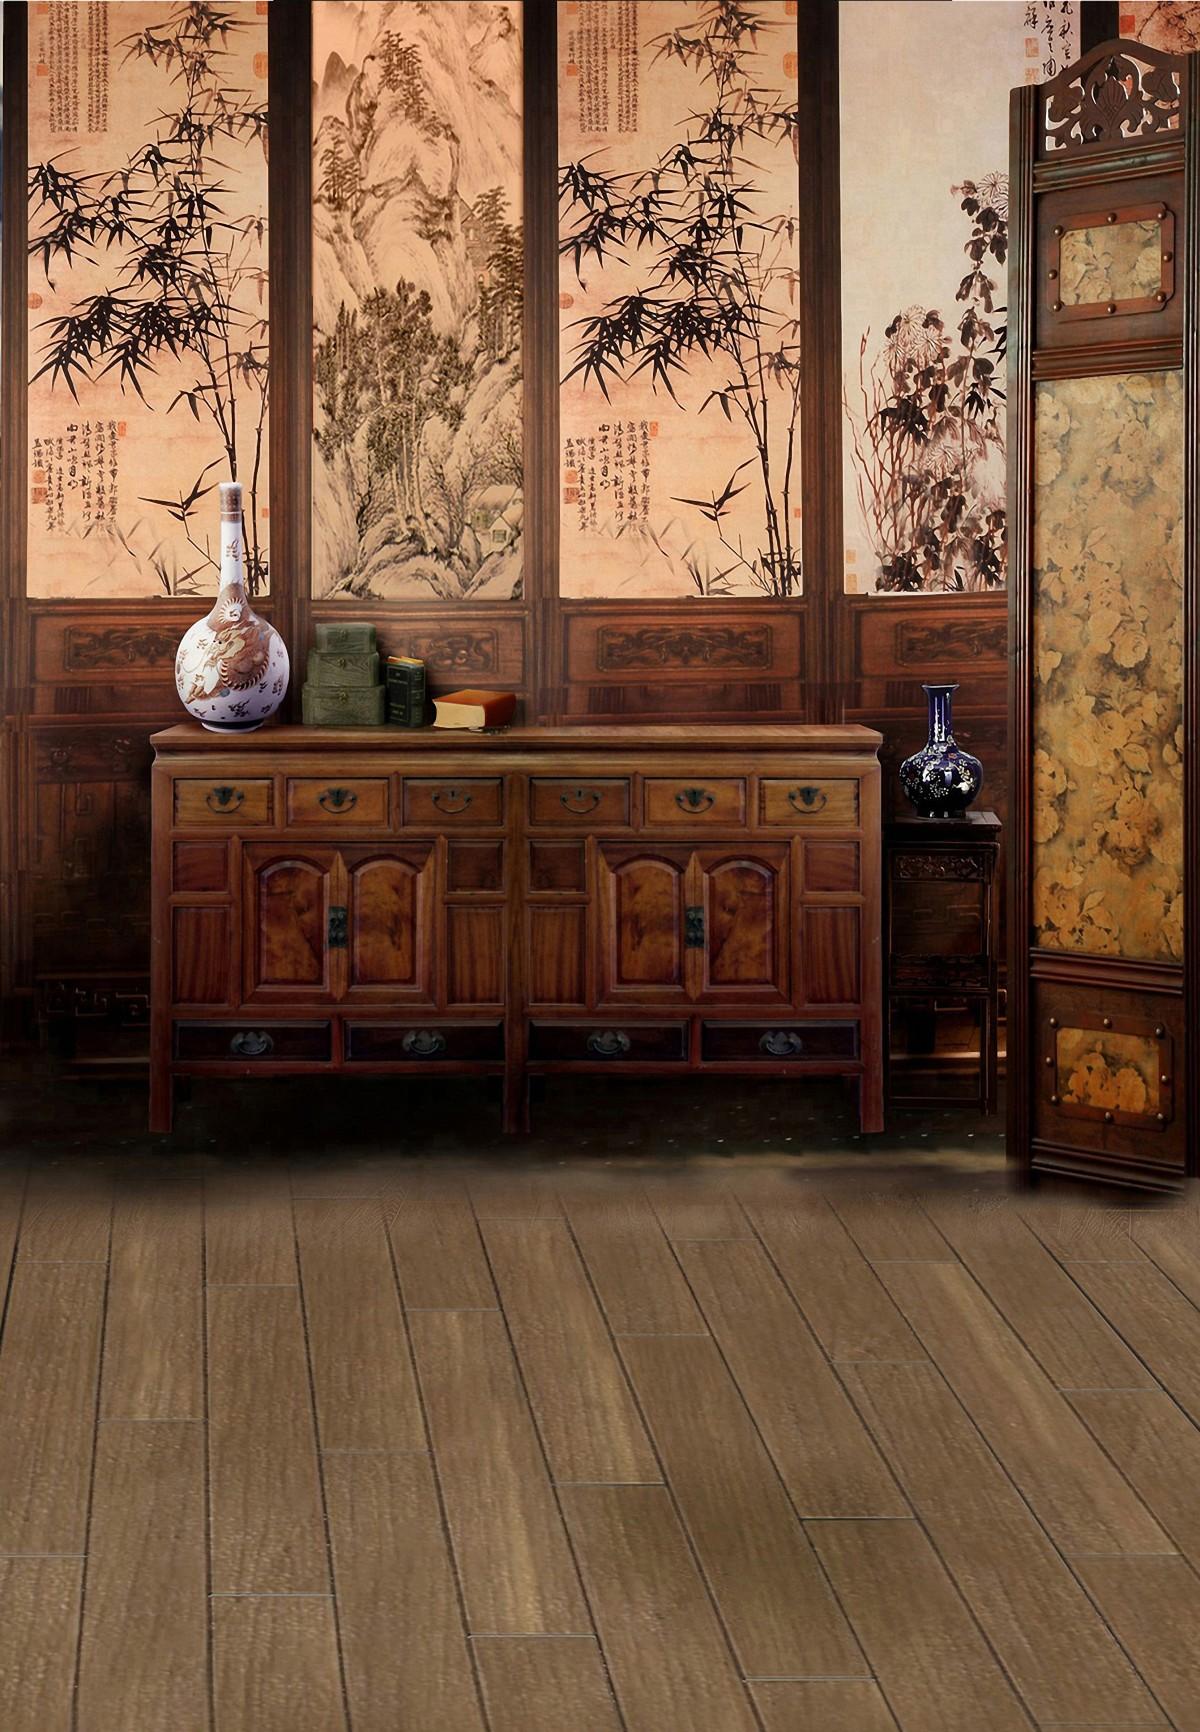 China Chinesisch Möbel Stock Bodenbelag Holzboden Hartholz Mauer Laminatboden  Holz Holzbeize Innenarchitektur Kabinett Fliese Kommode Tabelle